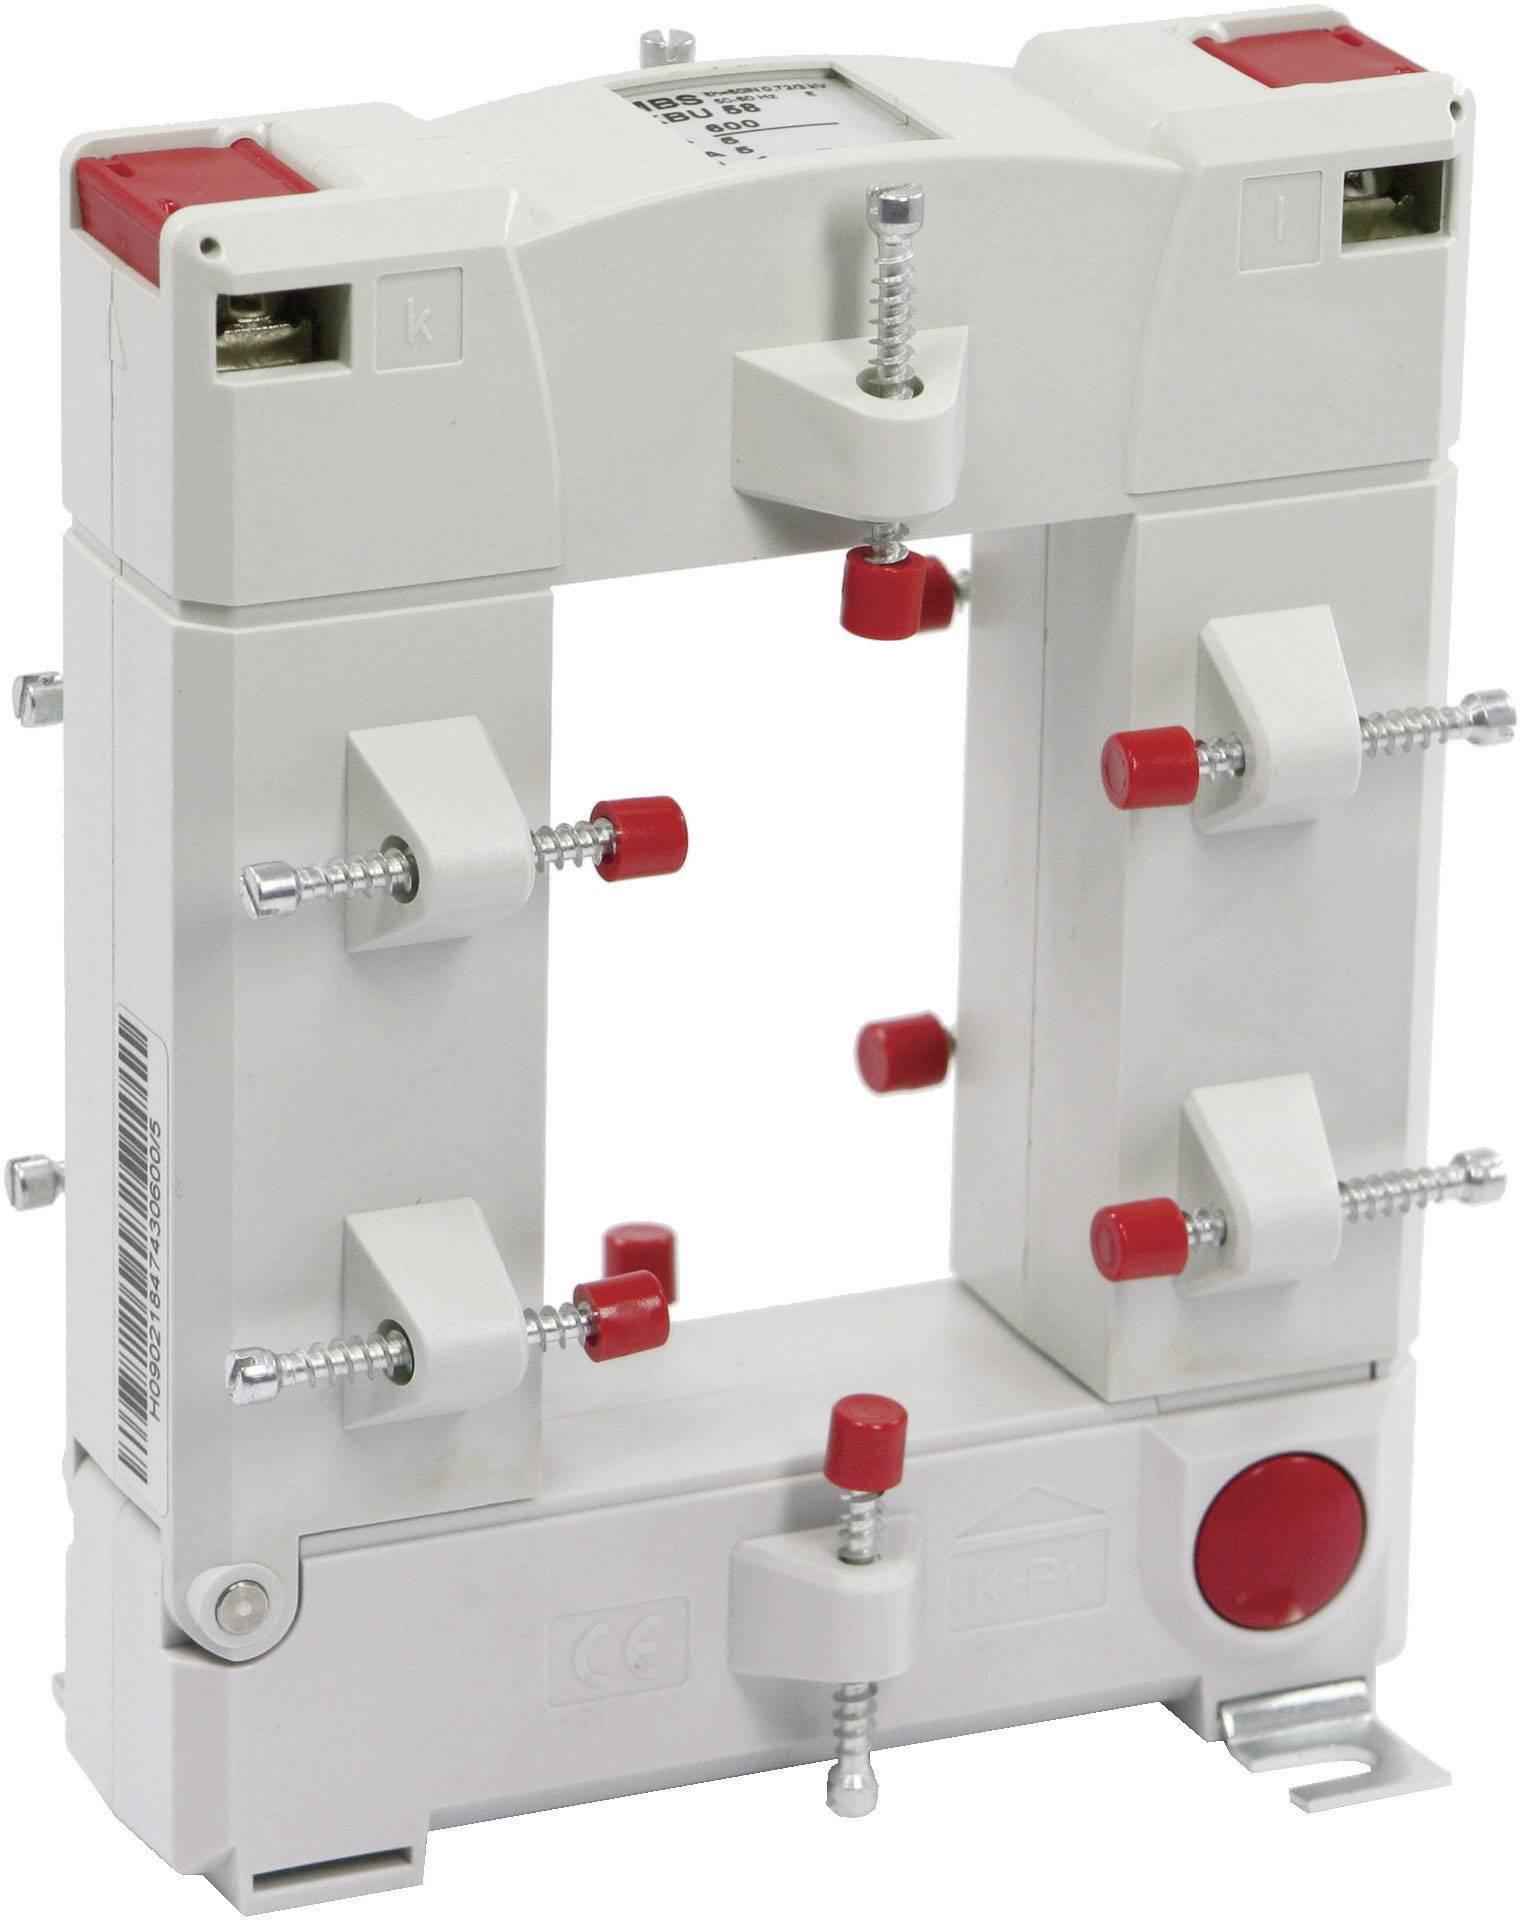 Zásuvný merací transformátor prúdu MBS KBU 58 1000/5 A 10VA Kl.1